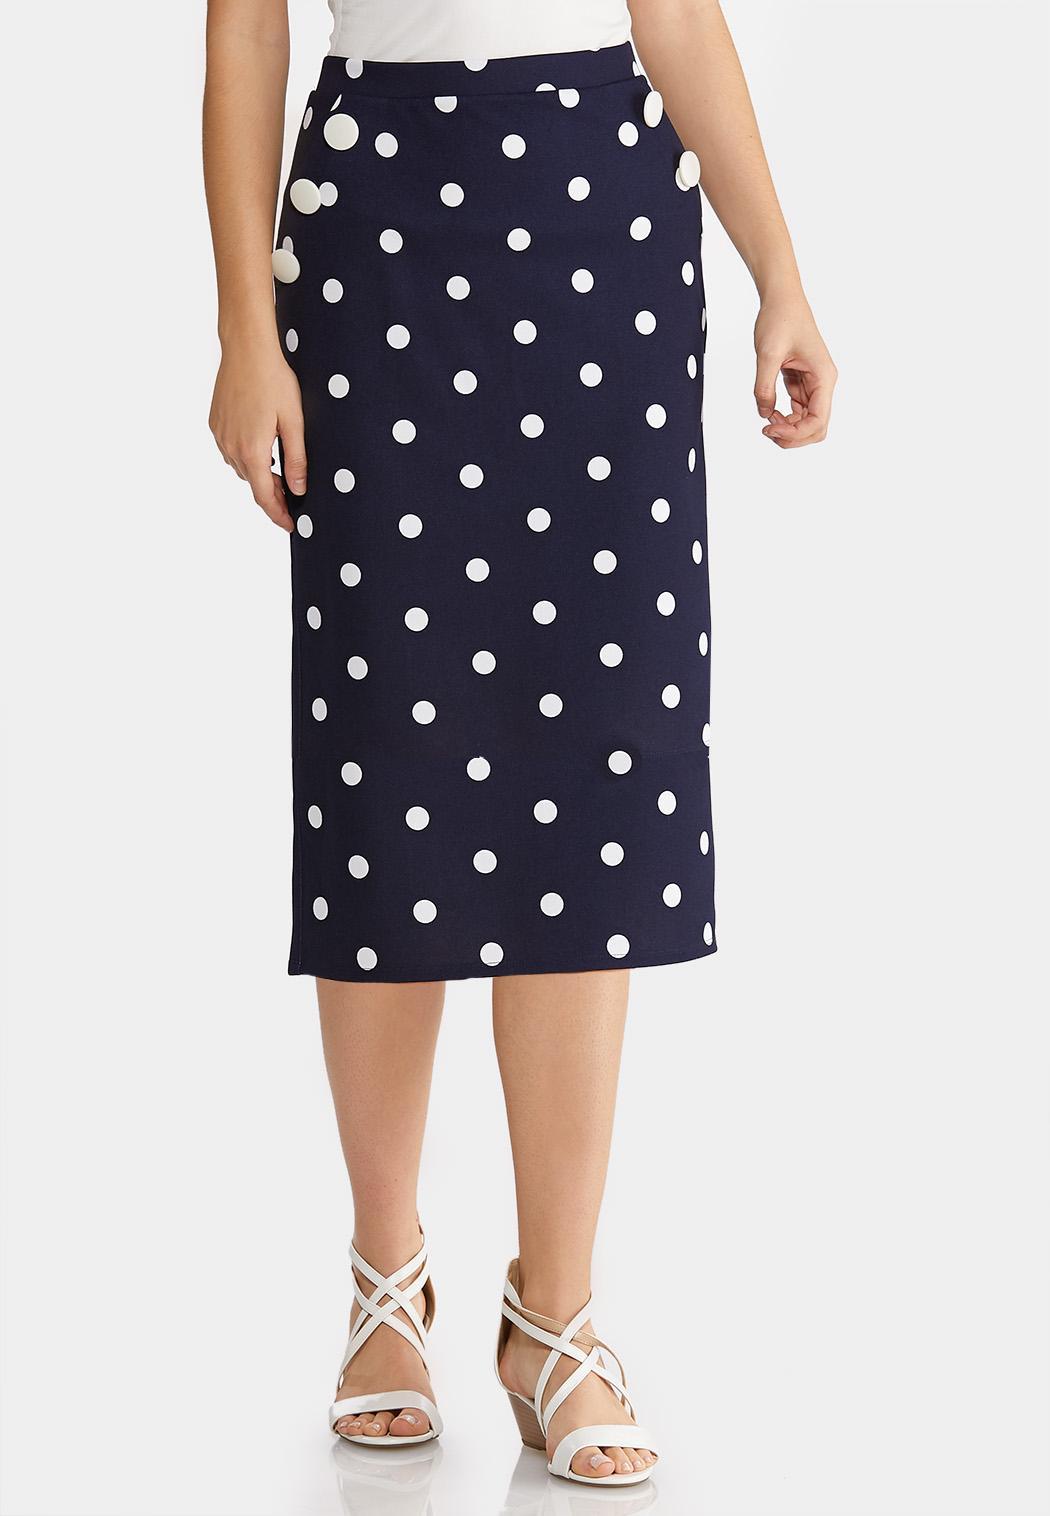 b04a03fbfc Plus Size Polka Dot Pencil Skirt Skirts Cato Fashions